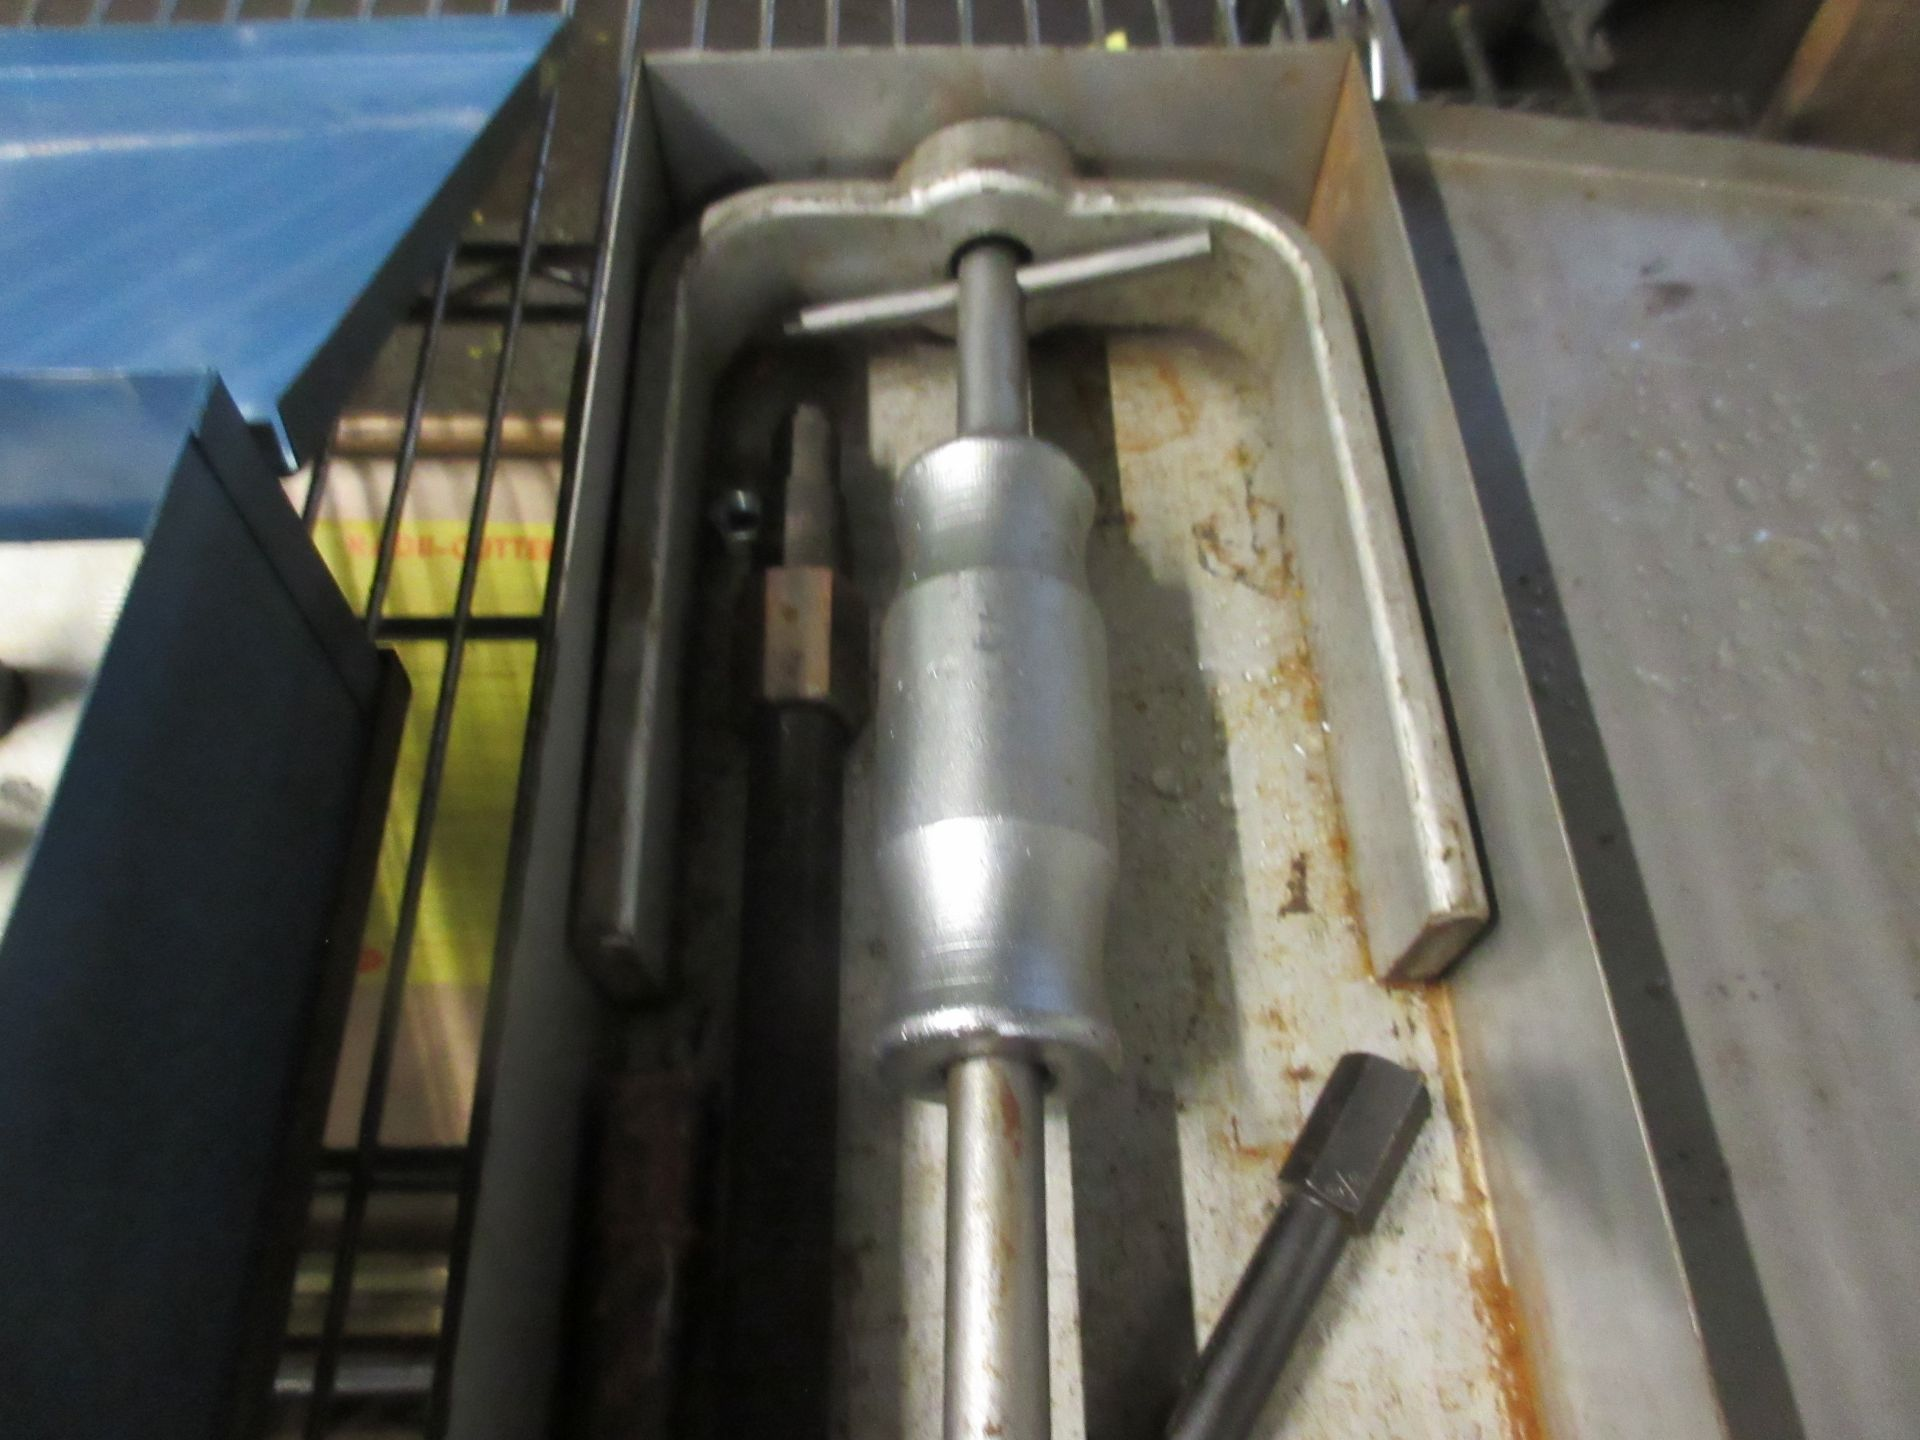 Owatonna (OTC) Hydraulic 10,000 PSI Hy. Torque Unit Model C S/N 53432 - Image 2 of 3